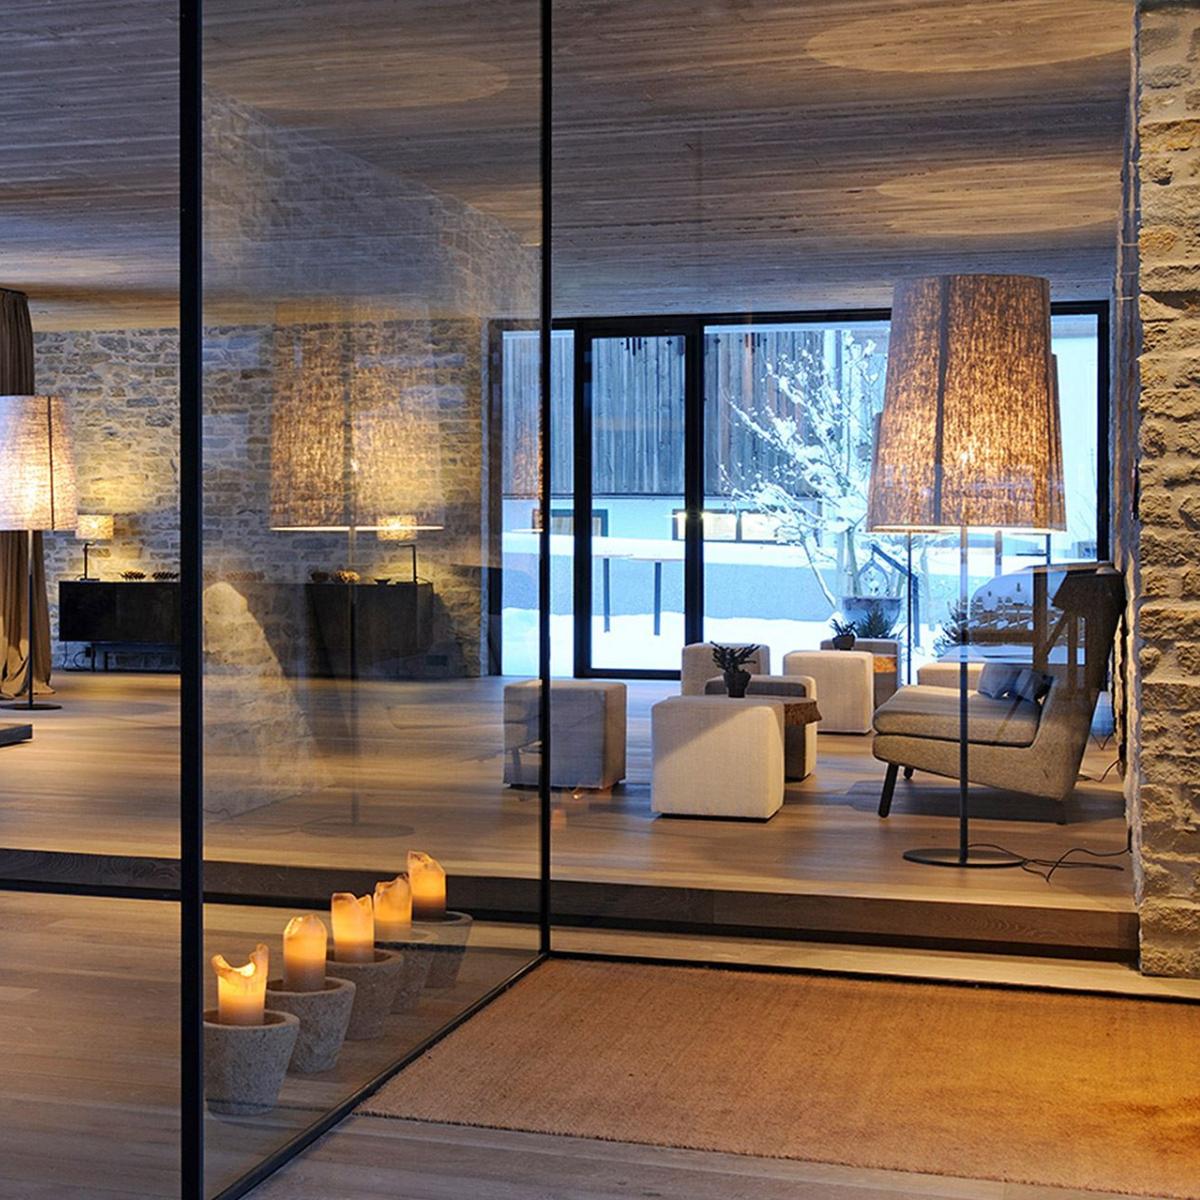 Wiesergut I Member of Design Hotels (4)